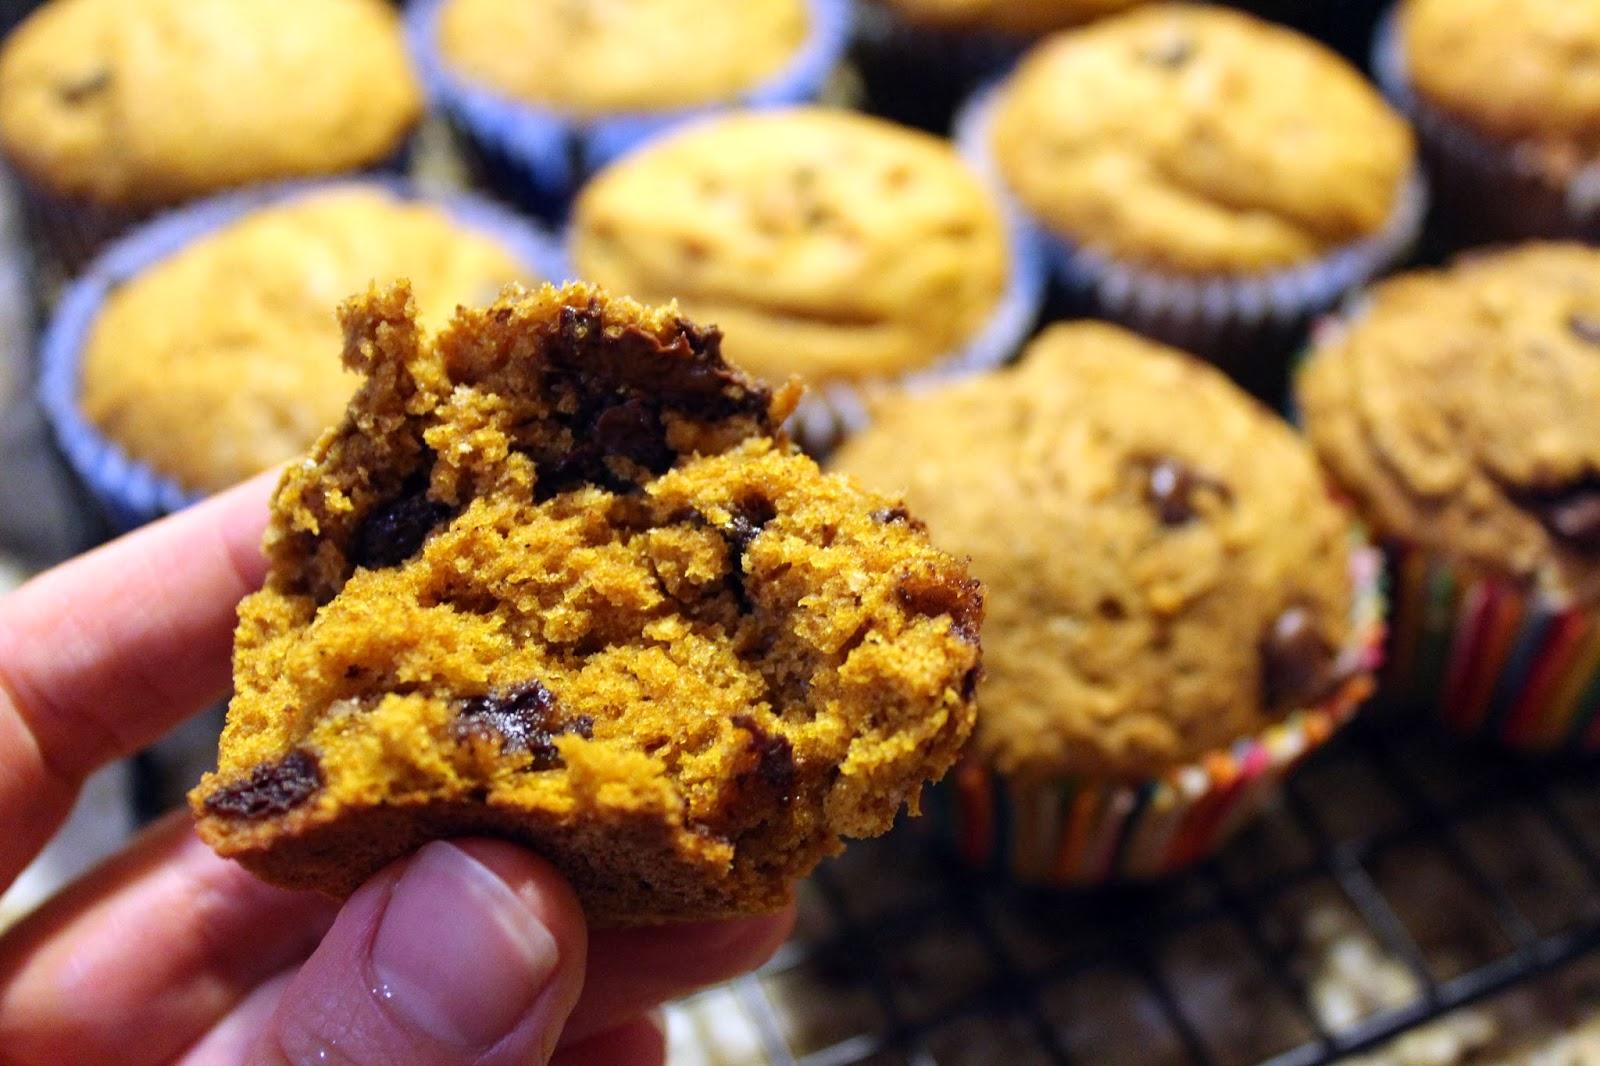 muffin texture.jpg